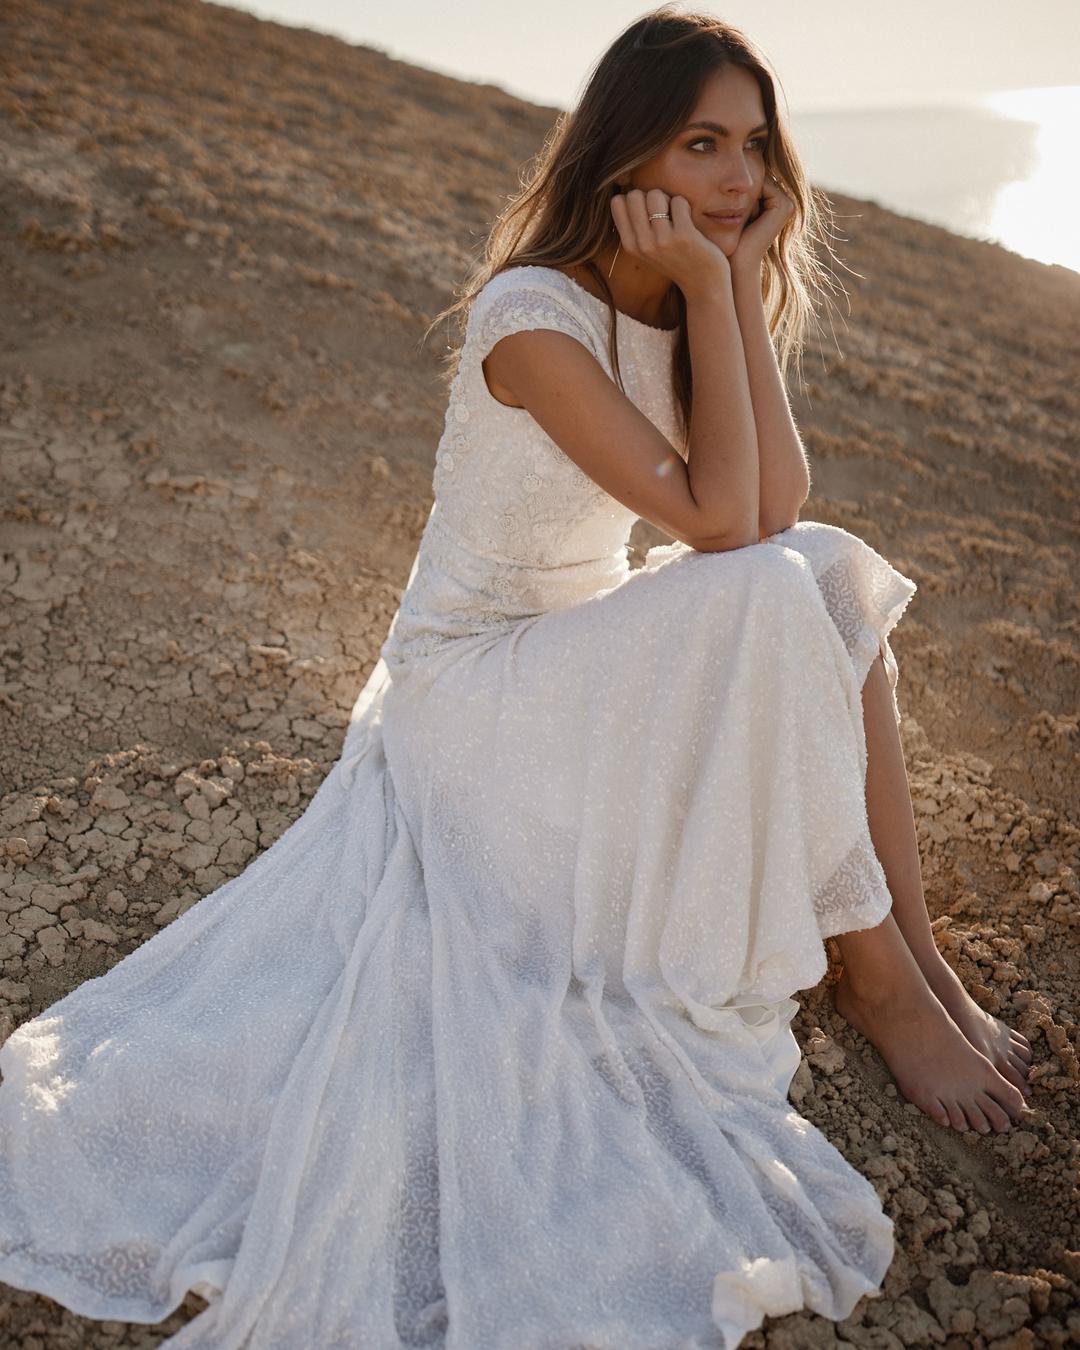 rosabell dress photo